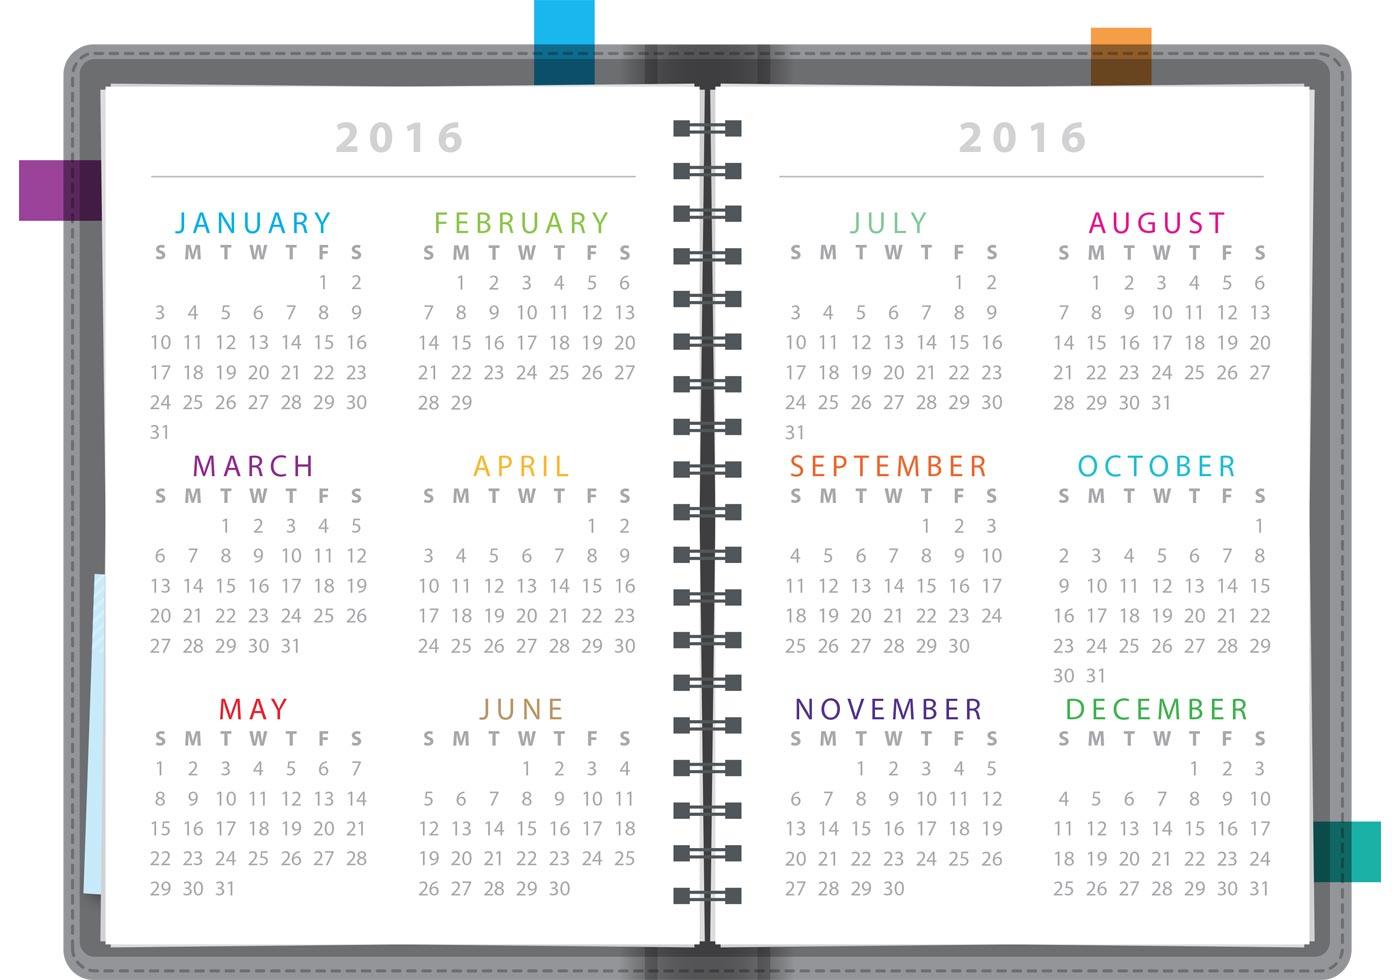 Planner Calendar Notebook Free Download : Calendar notebook download free vector art stock